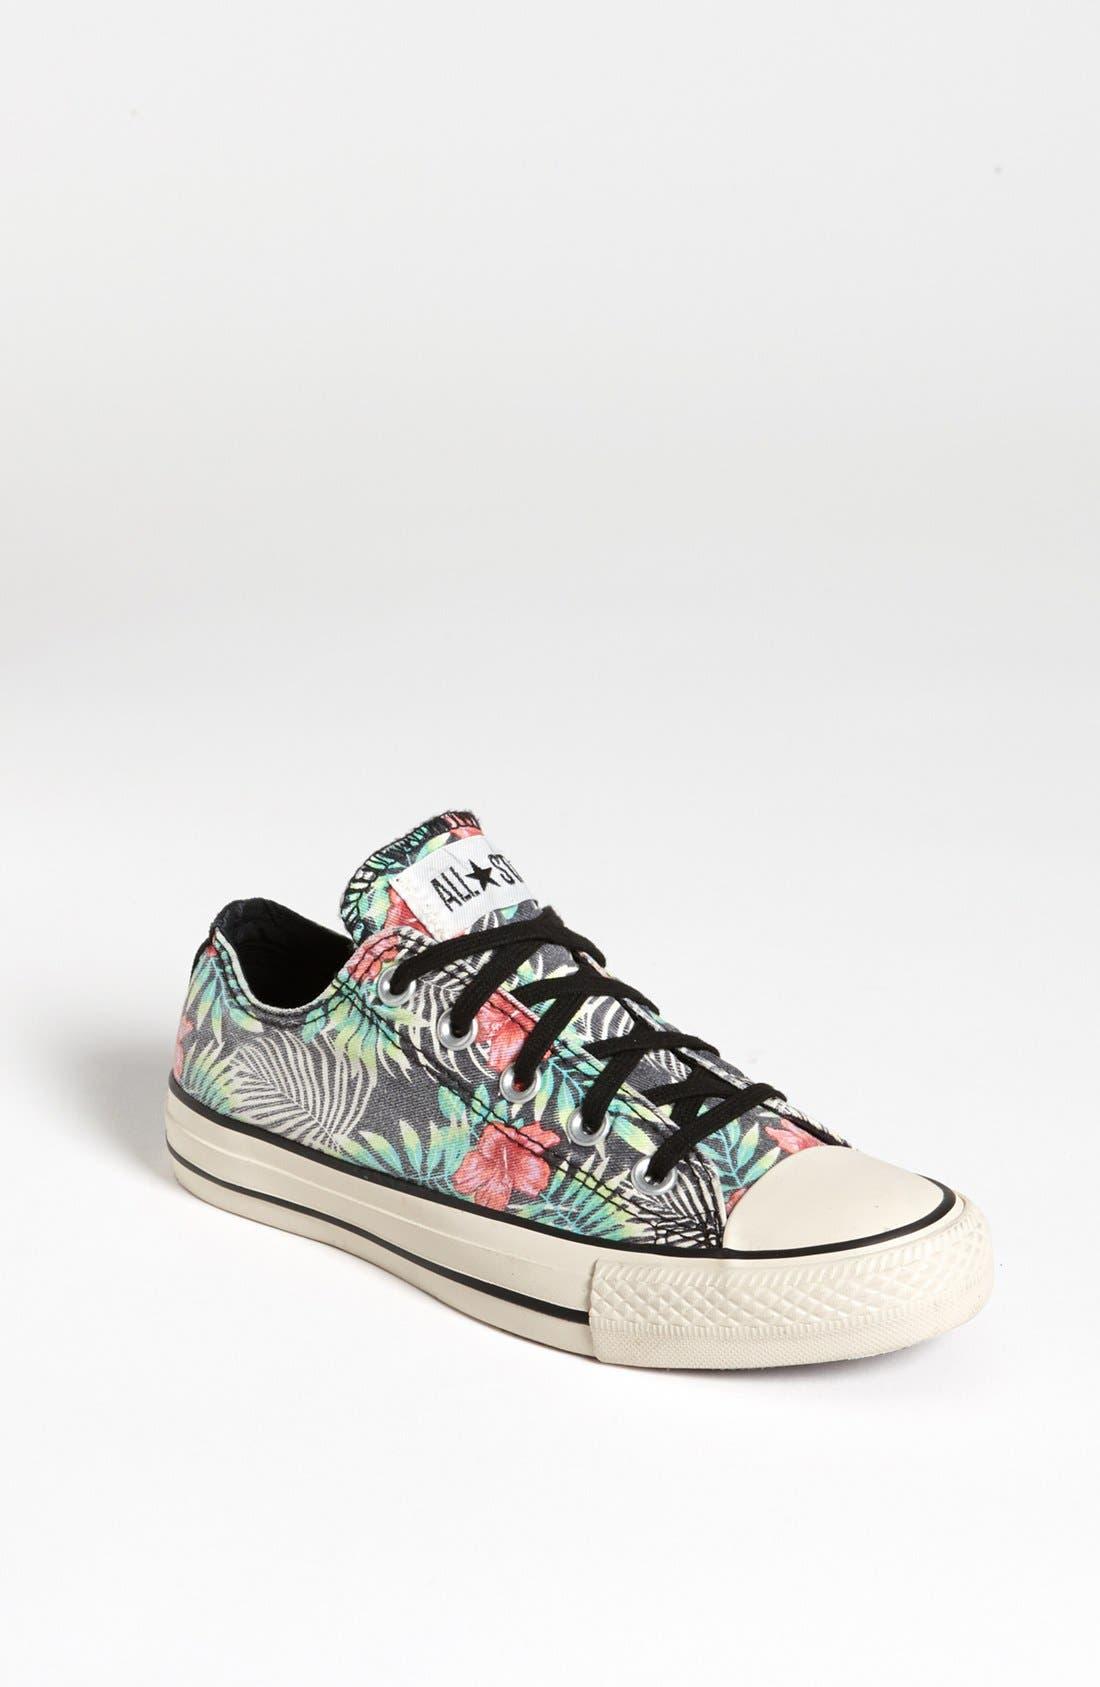 Alternate Image 1 Selected - Converse Chuck Taylor® All Star® 'Florida Keys' Sneaker (Women)